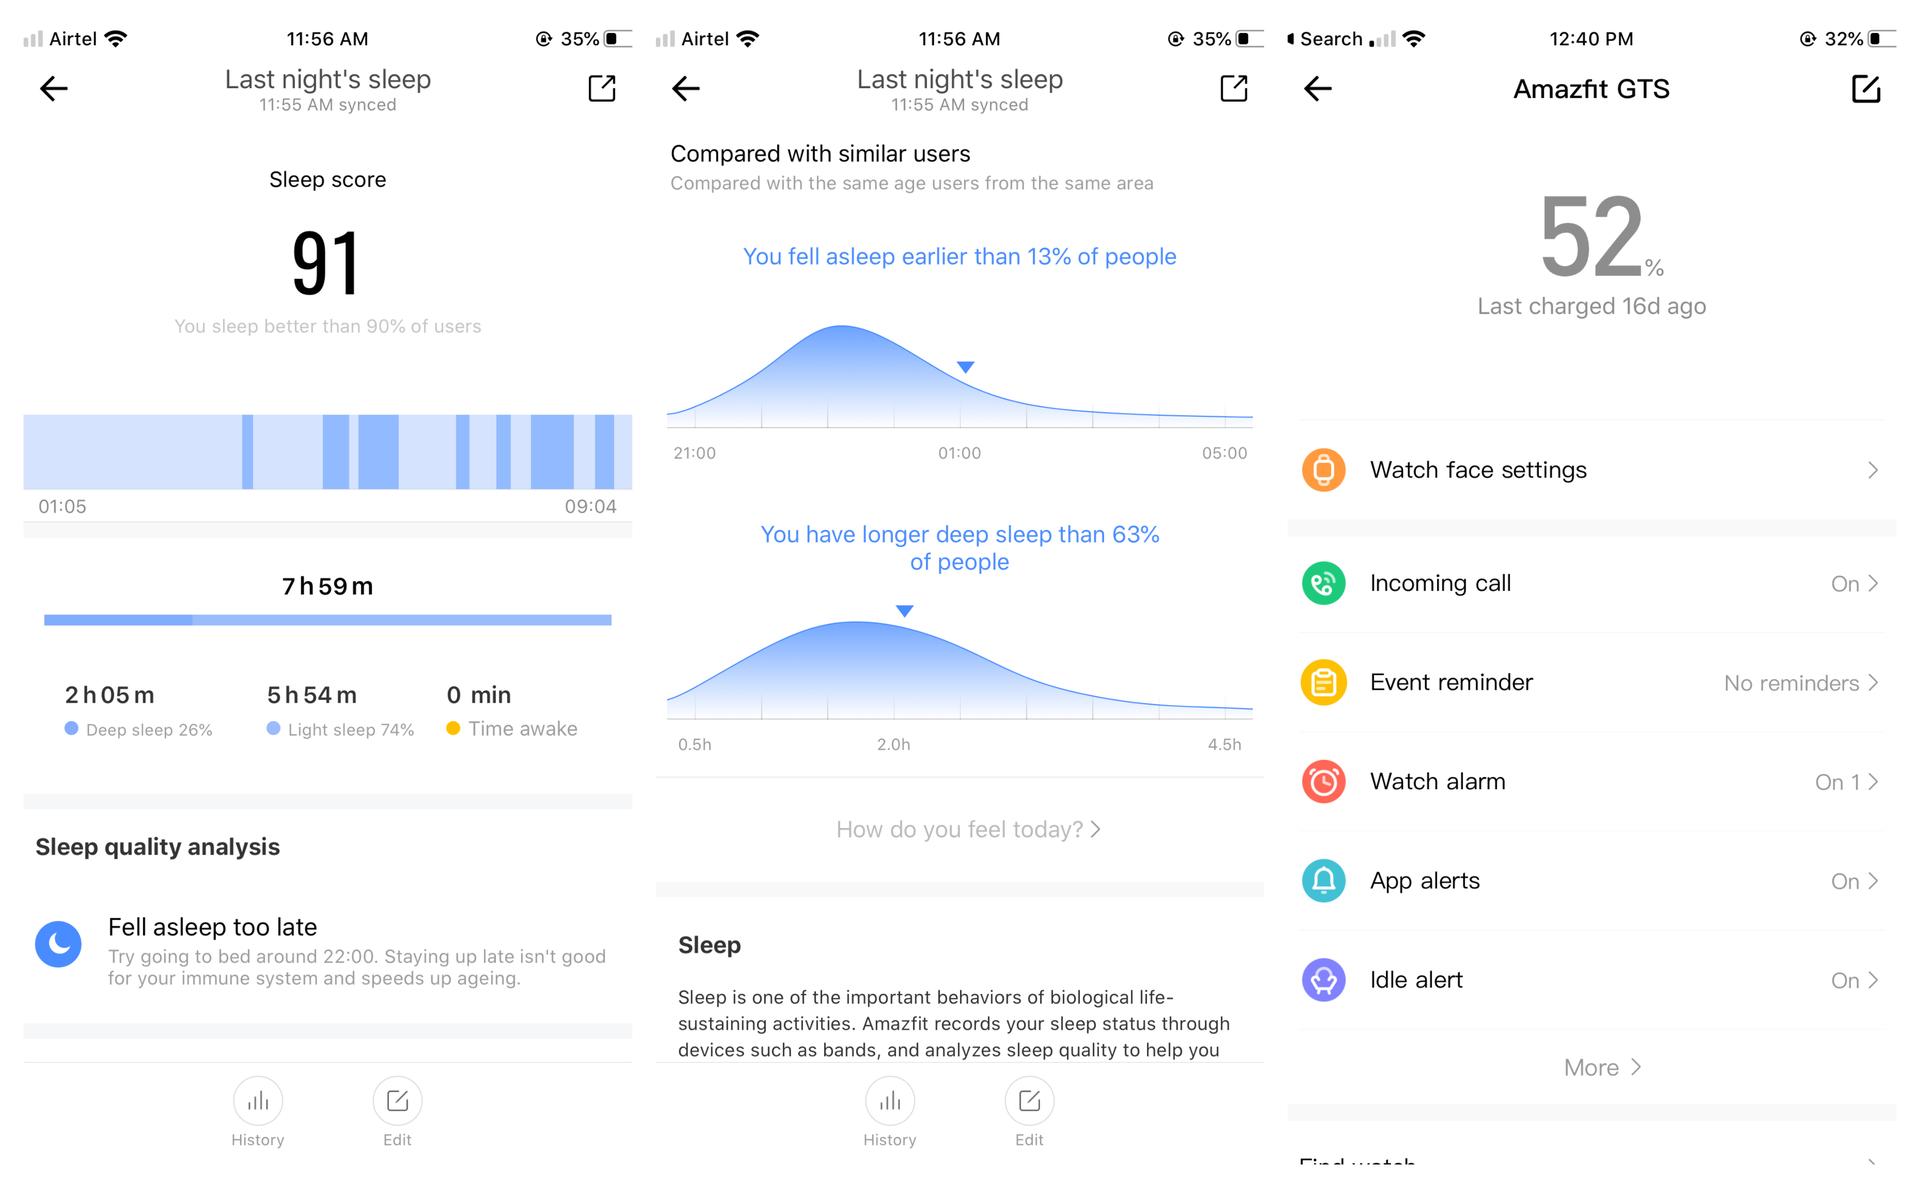 Amazfit GTS sleep tracking and watch settings screen